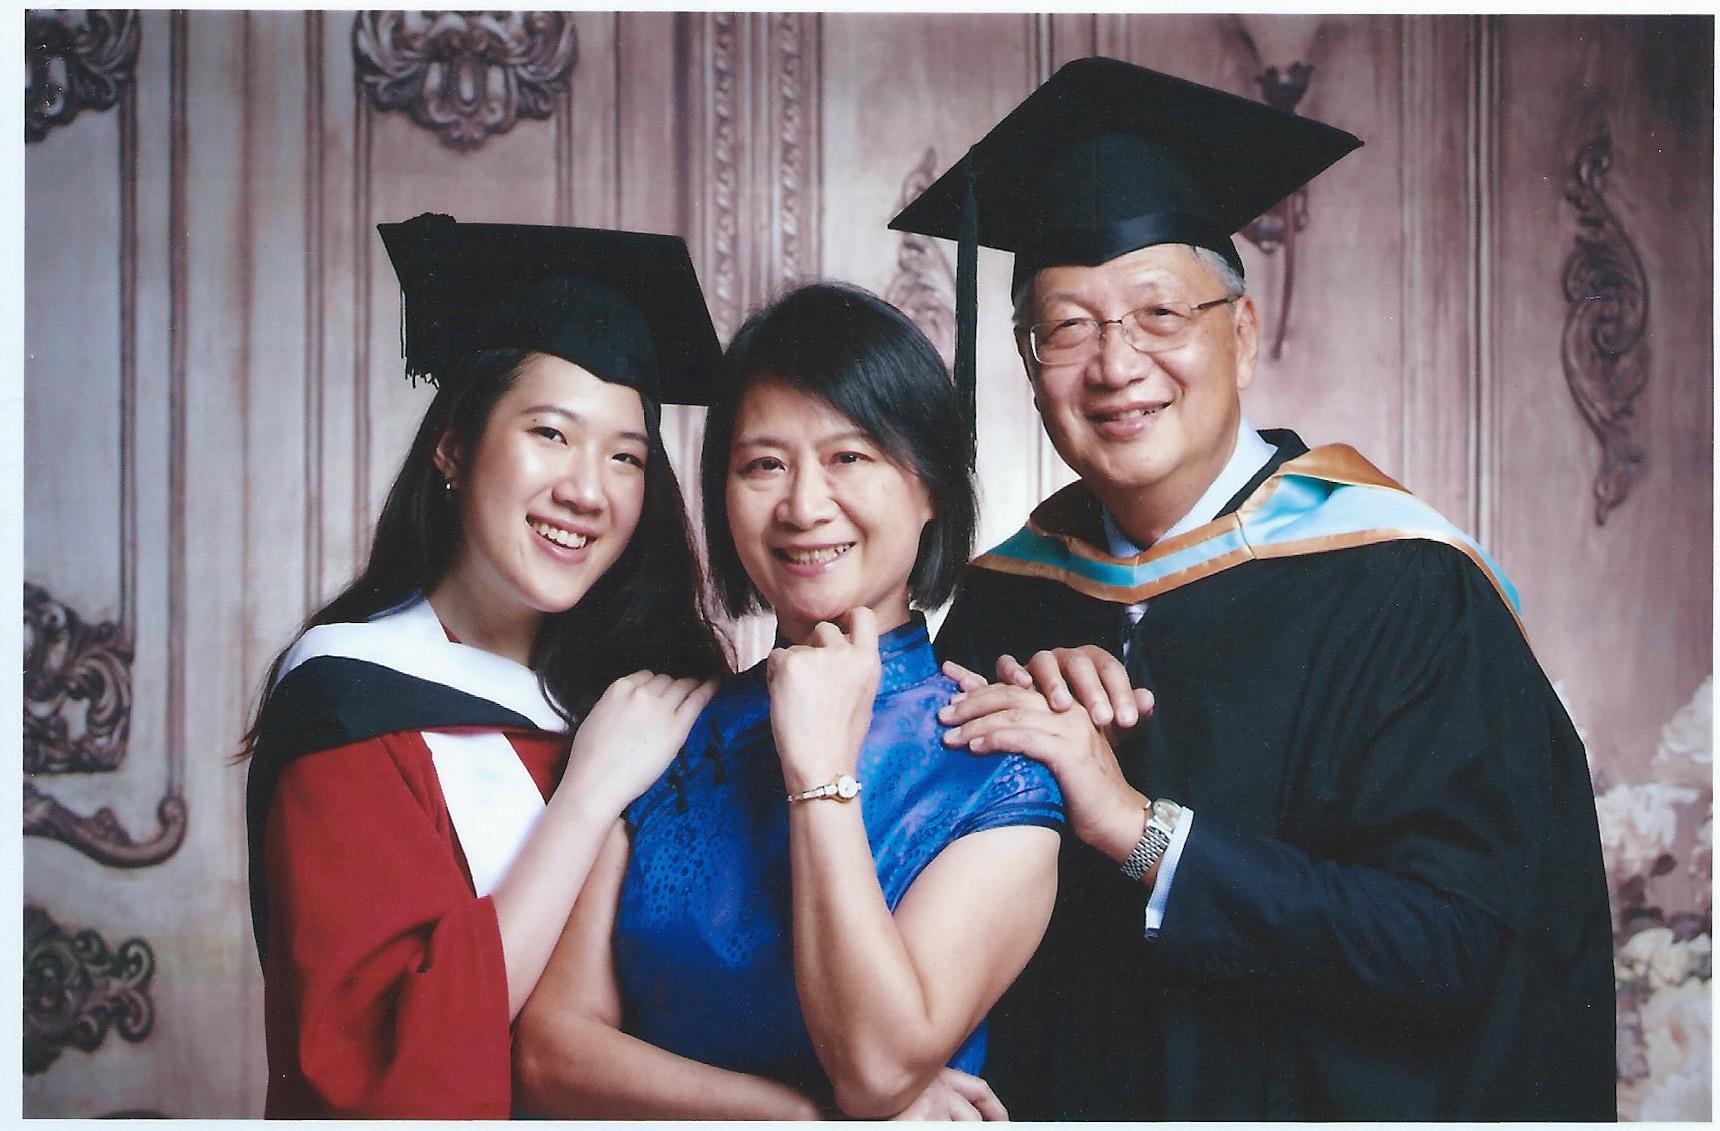 tiffany-leung-grad-photo.jpeg